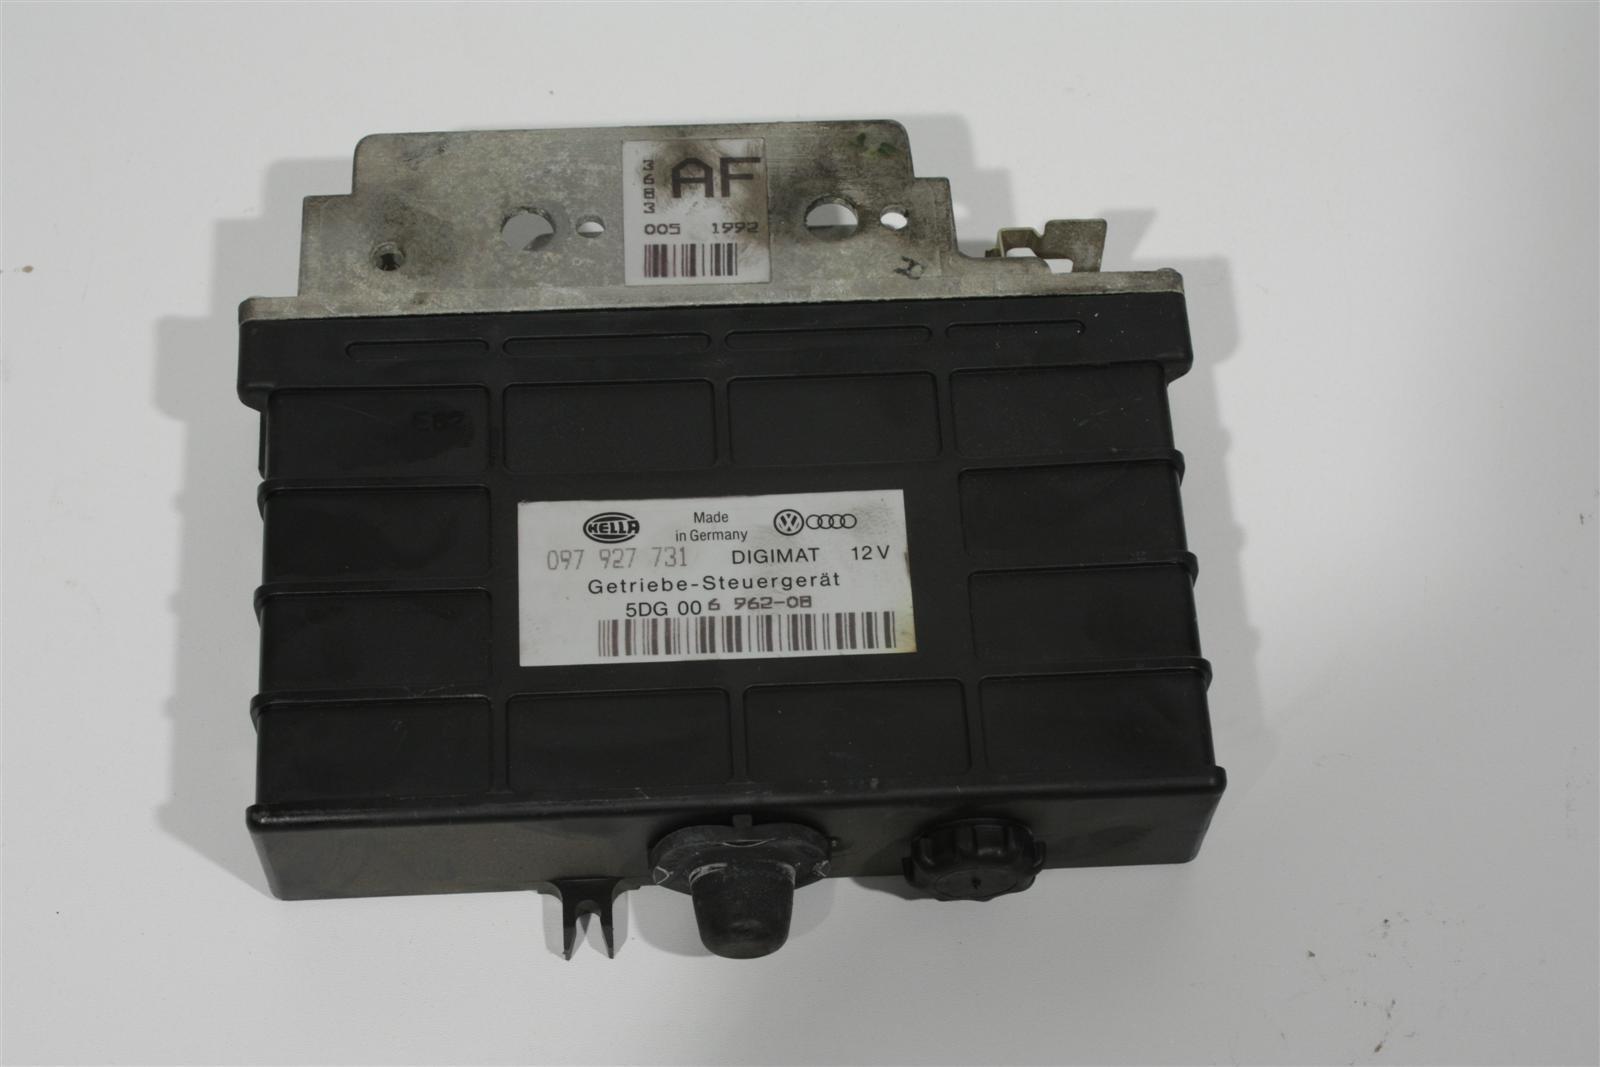 Audi 80/90 Typ 89/B4 2.3l NG Steuergerät Automatikgetriebe 097927731AF